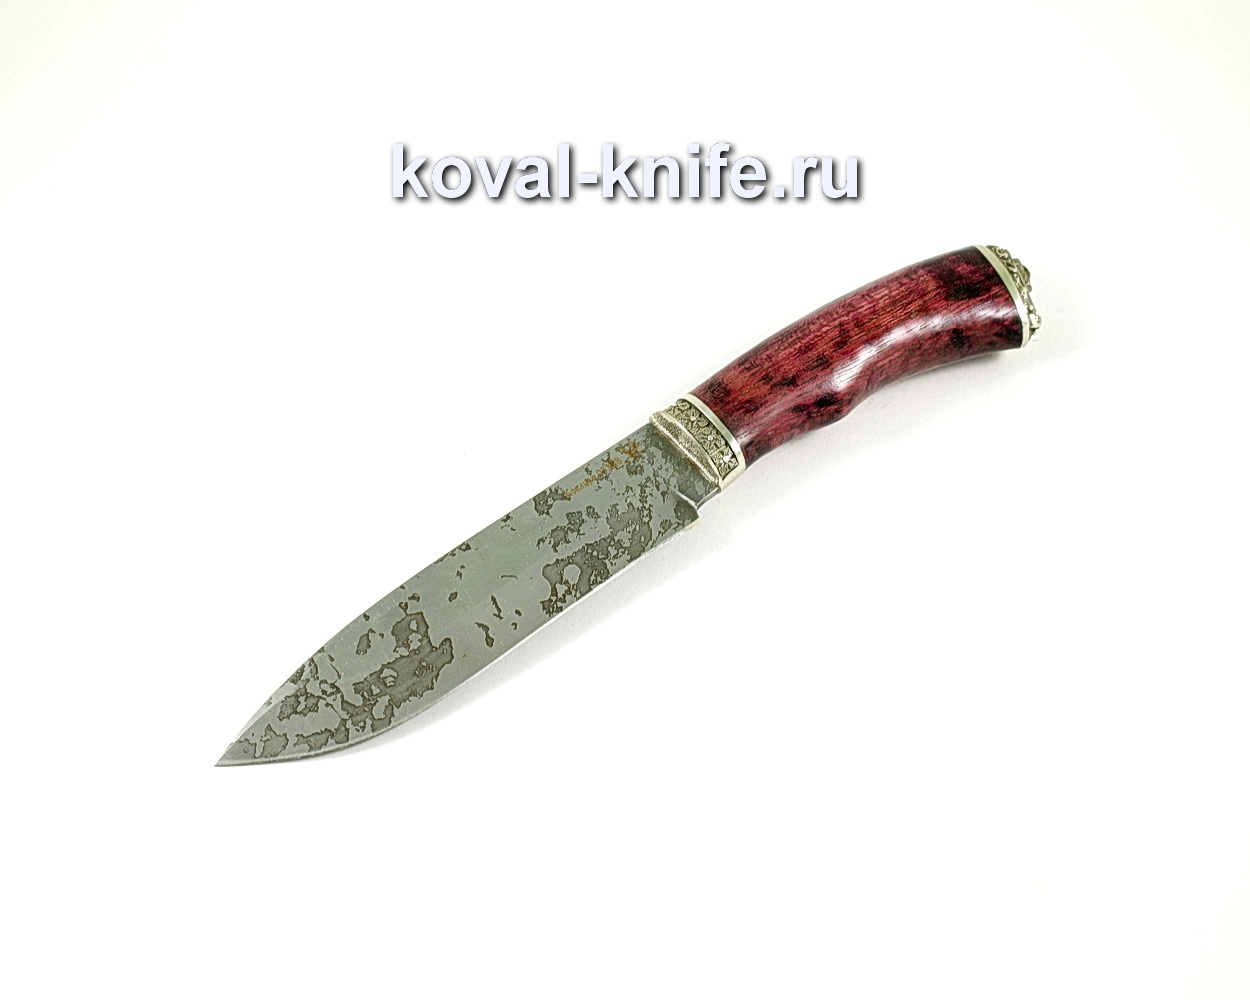 Нож Орлан (сталь 95х18), рукоять амарант, литье A241